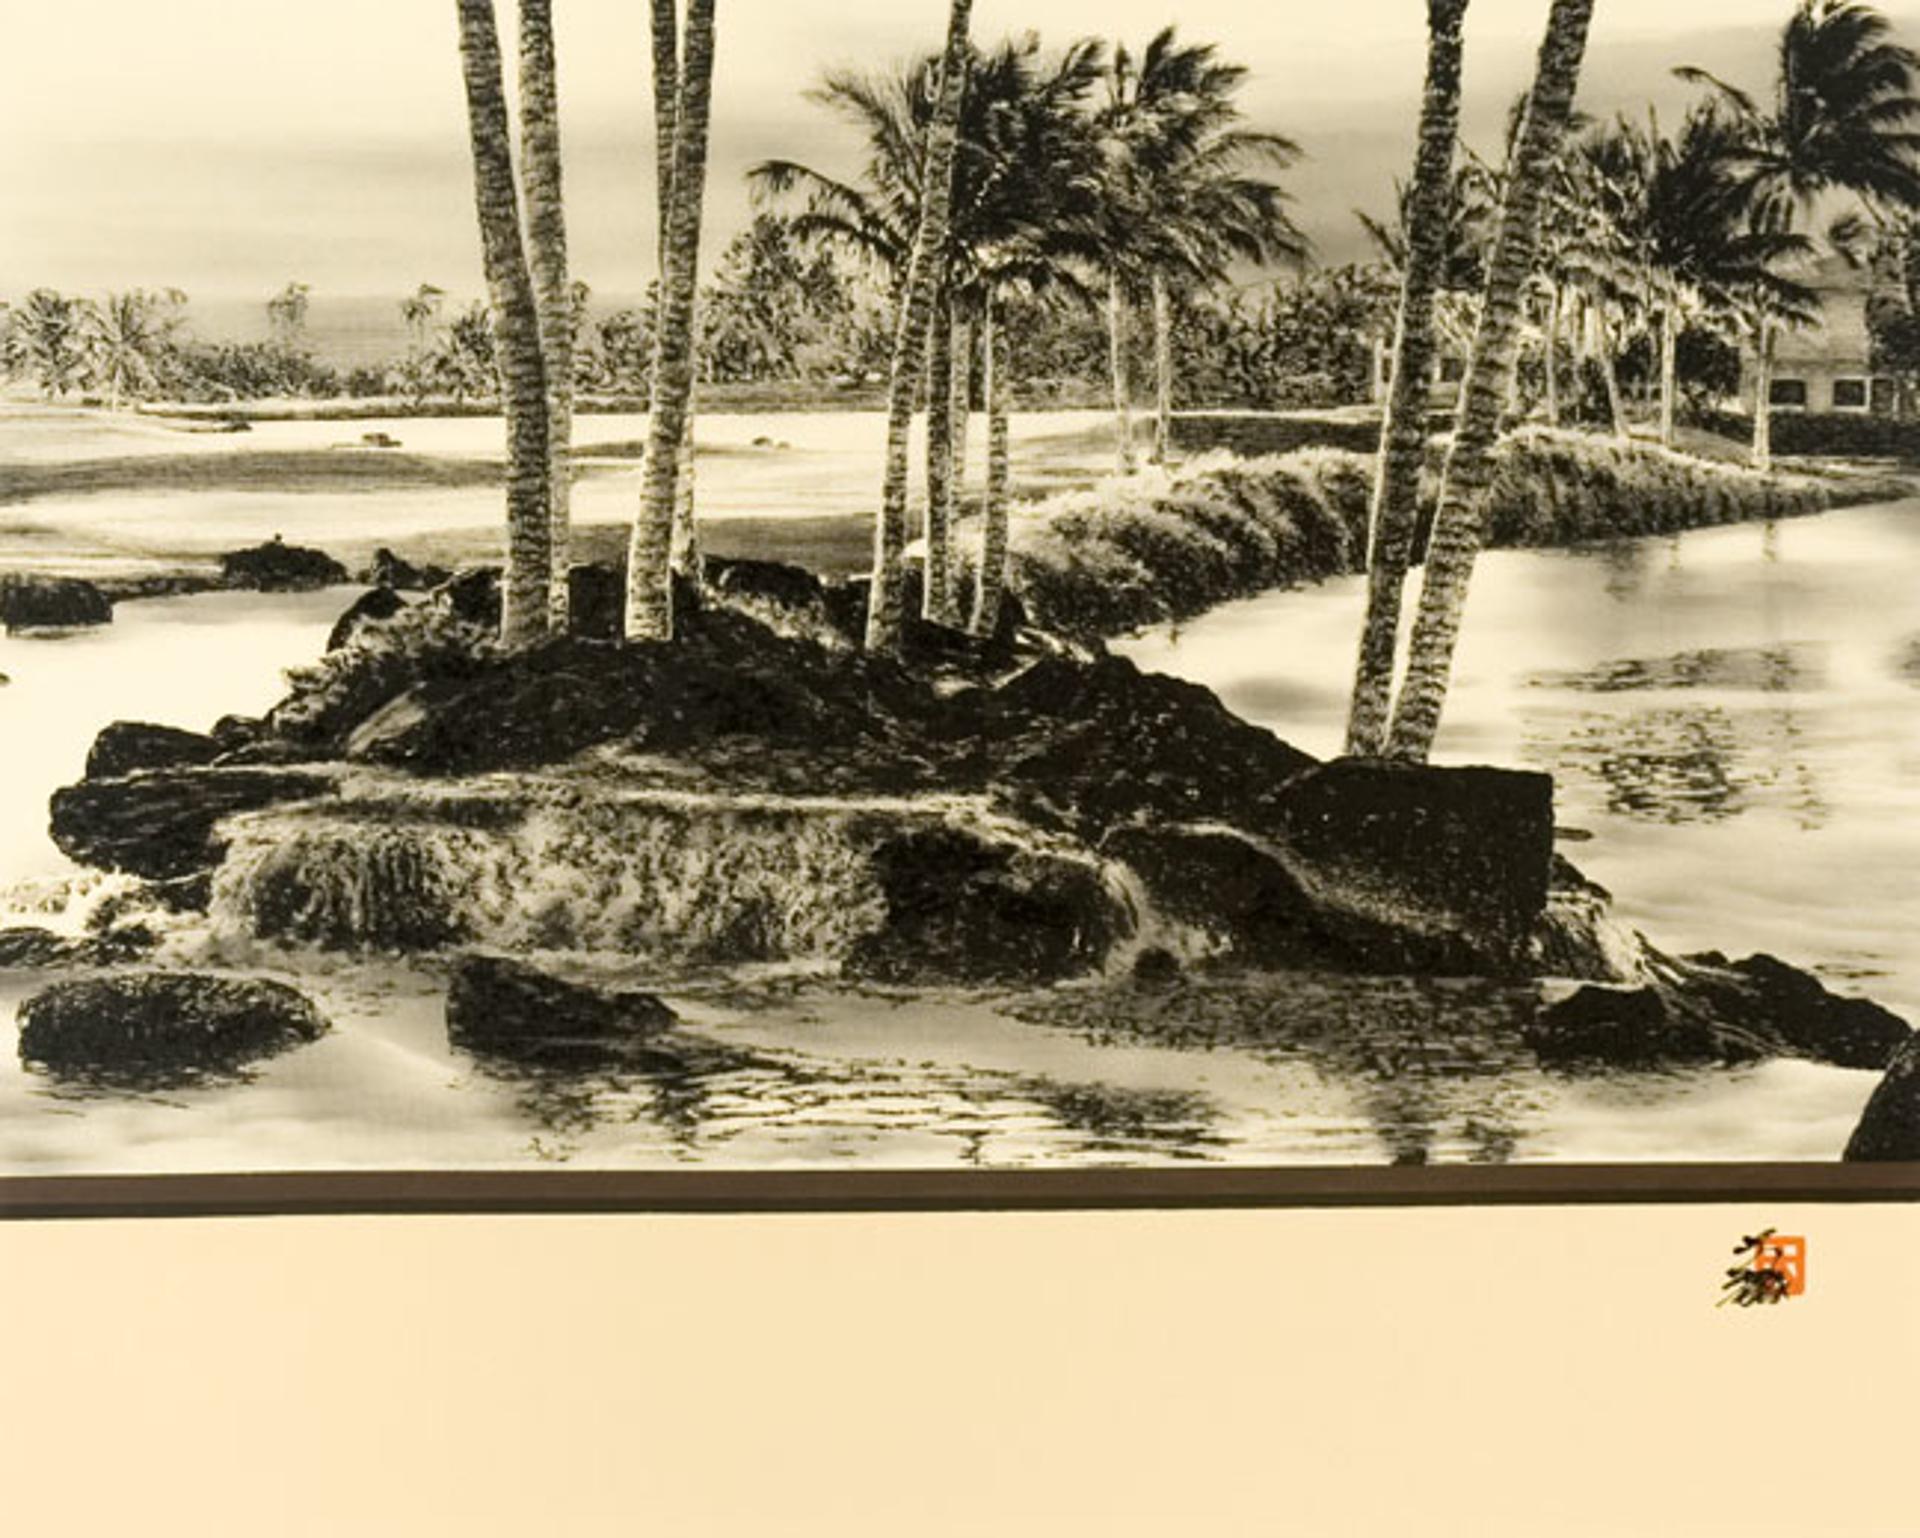 Big Island, Waikaloa by Hisashi Otsuka